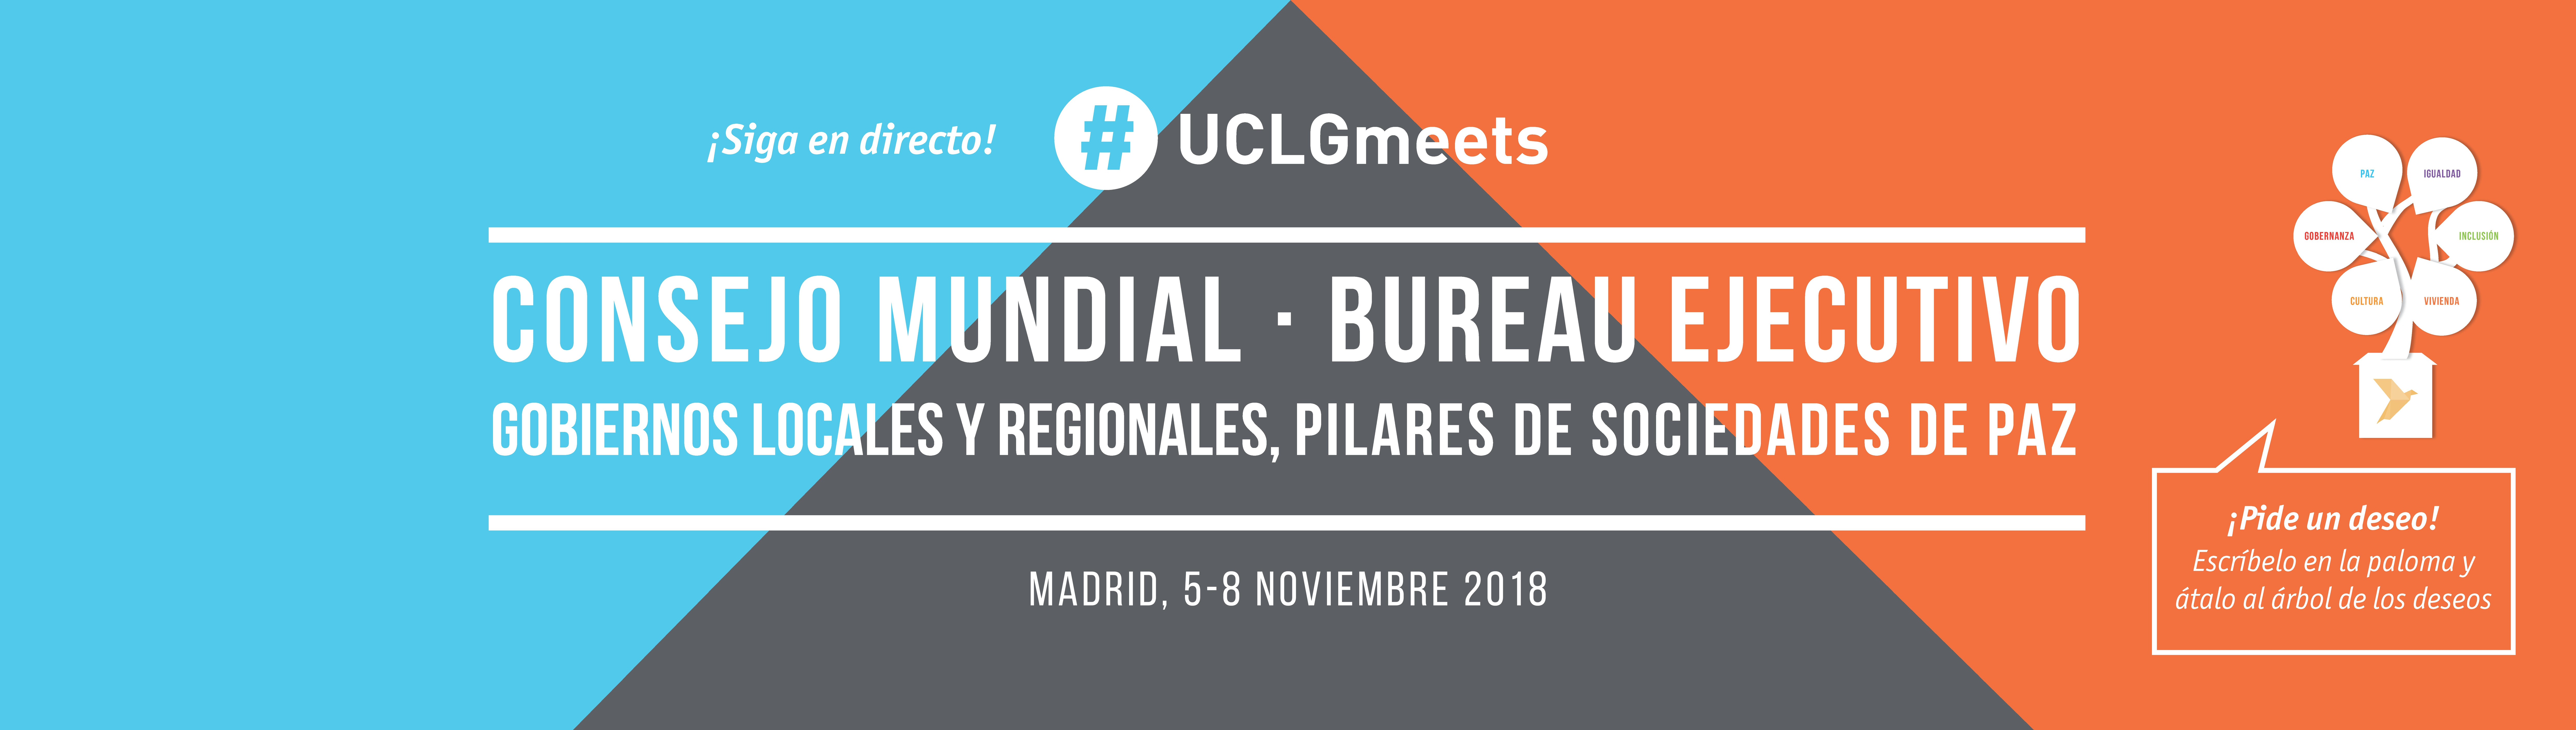 Madrid Consejo Mundial CGLU 2018